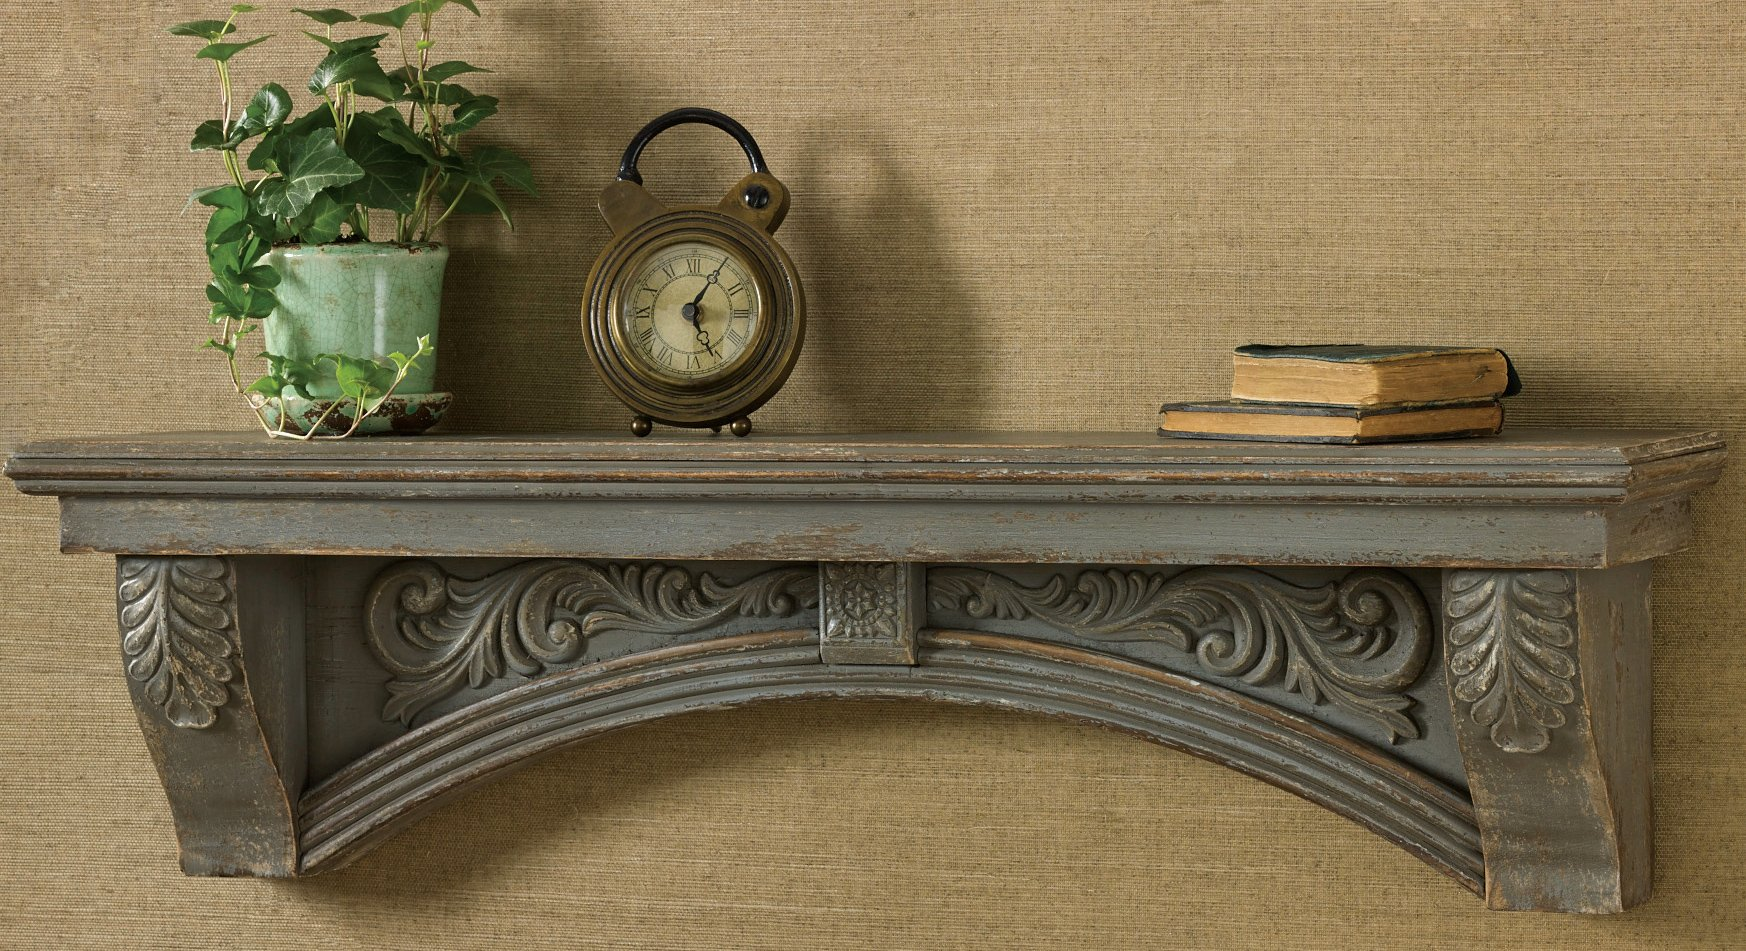 Mantel Shelf Aged Gray Dimensions: 9.25''h X 34.5''w X 6.5''d